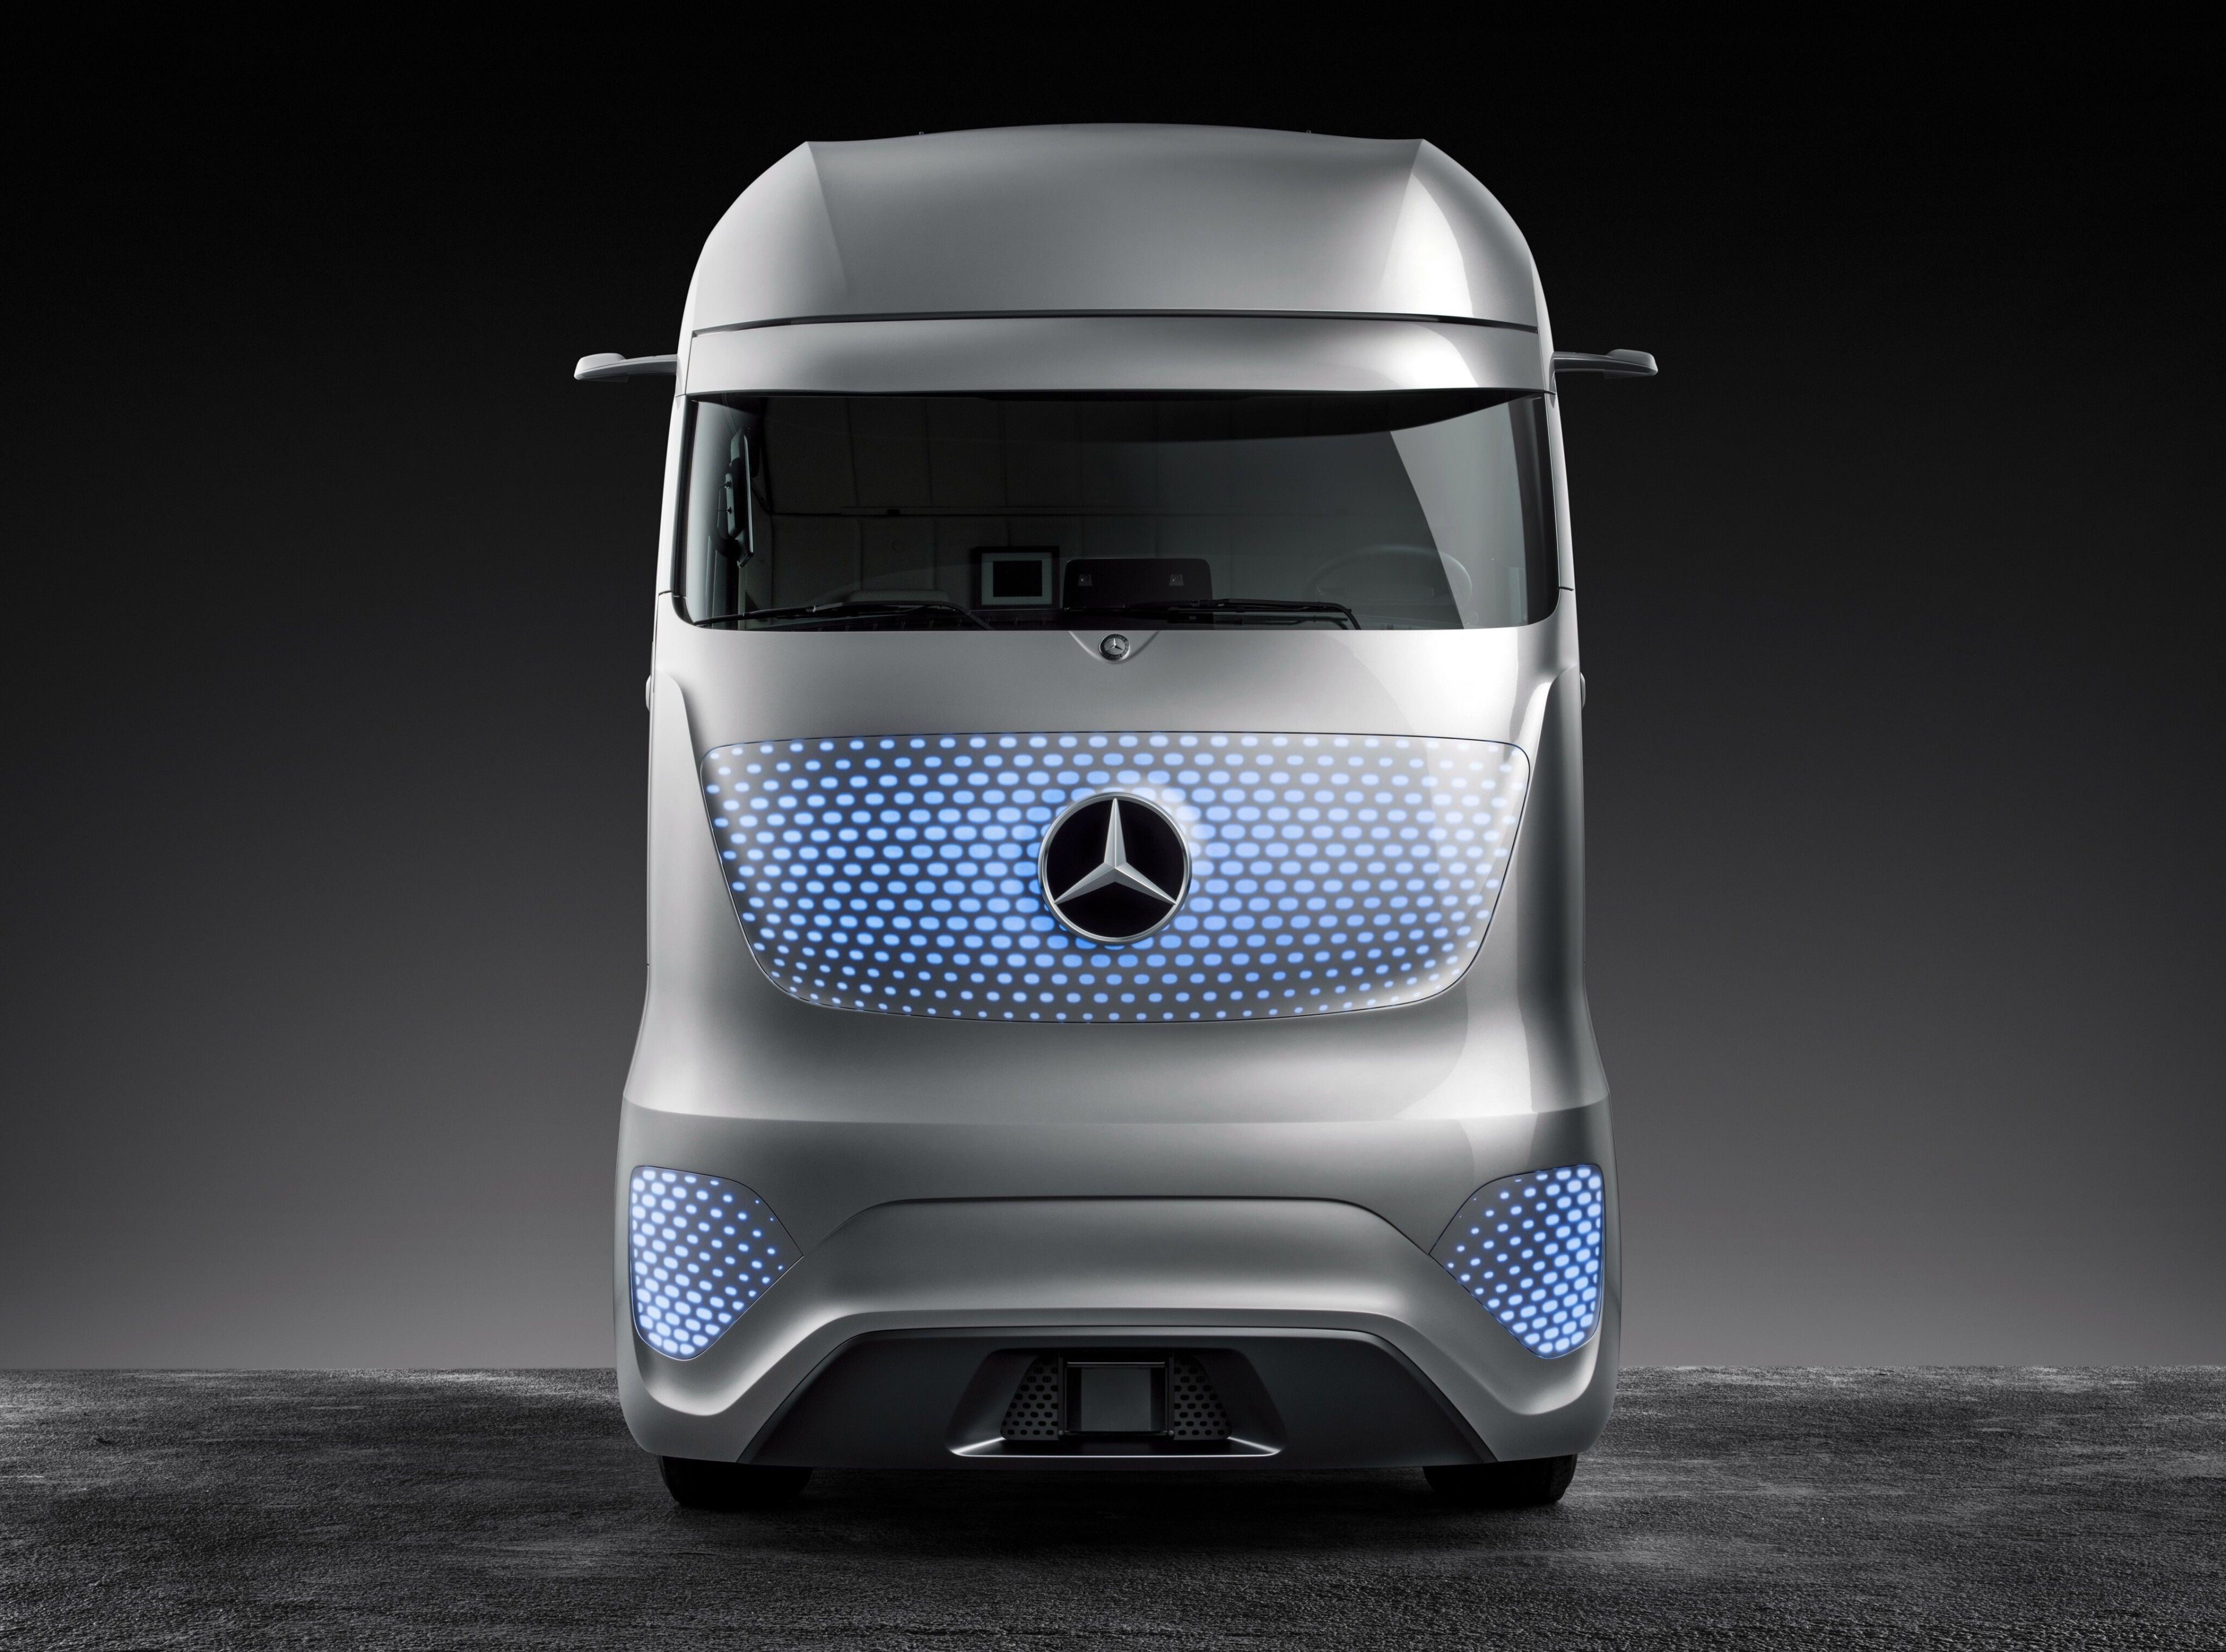 3840x2850 mercedes benz future truck 2025 4k cool wallpaper hd